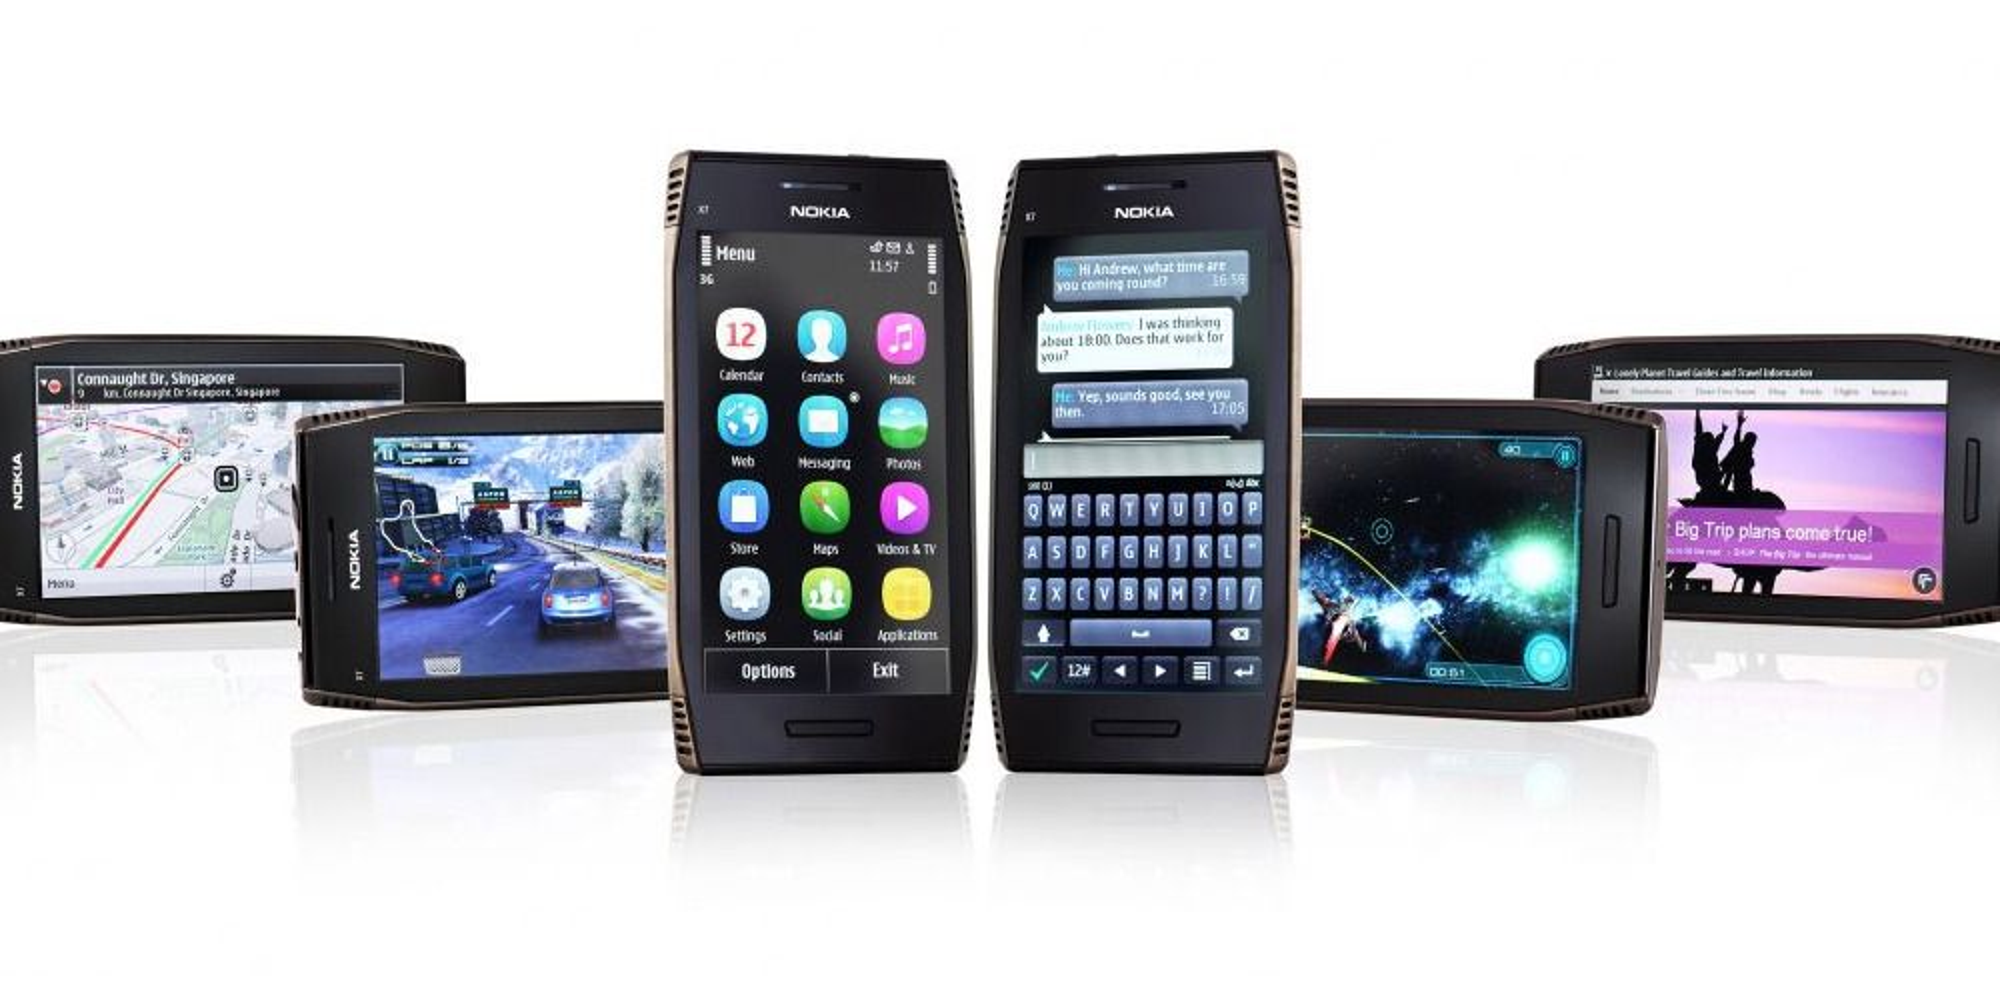 Nokia microsoftifiserer Symbian